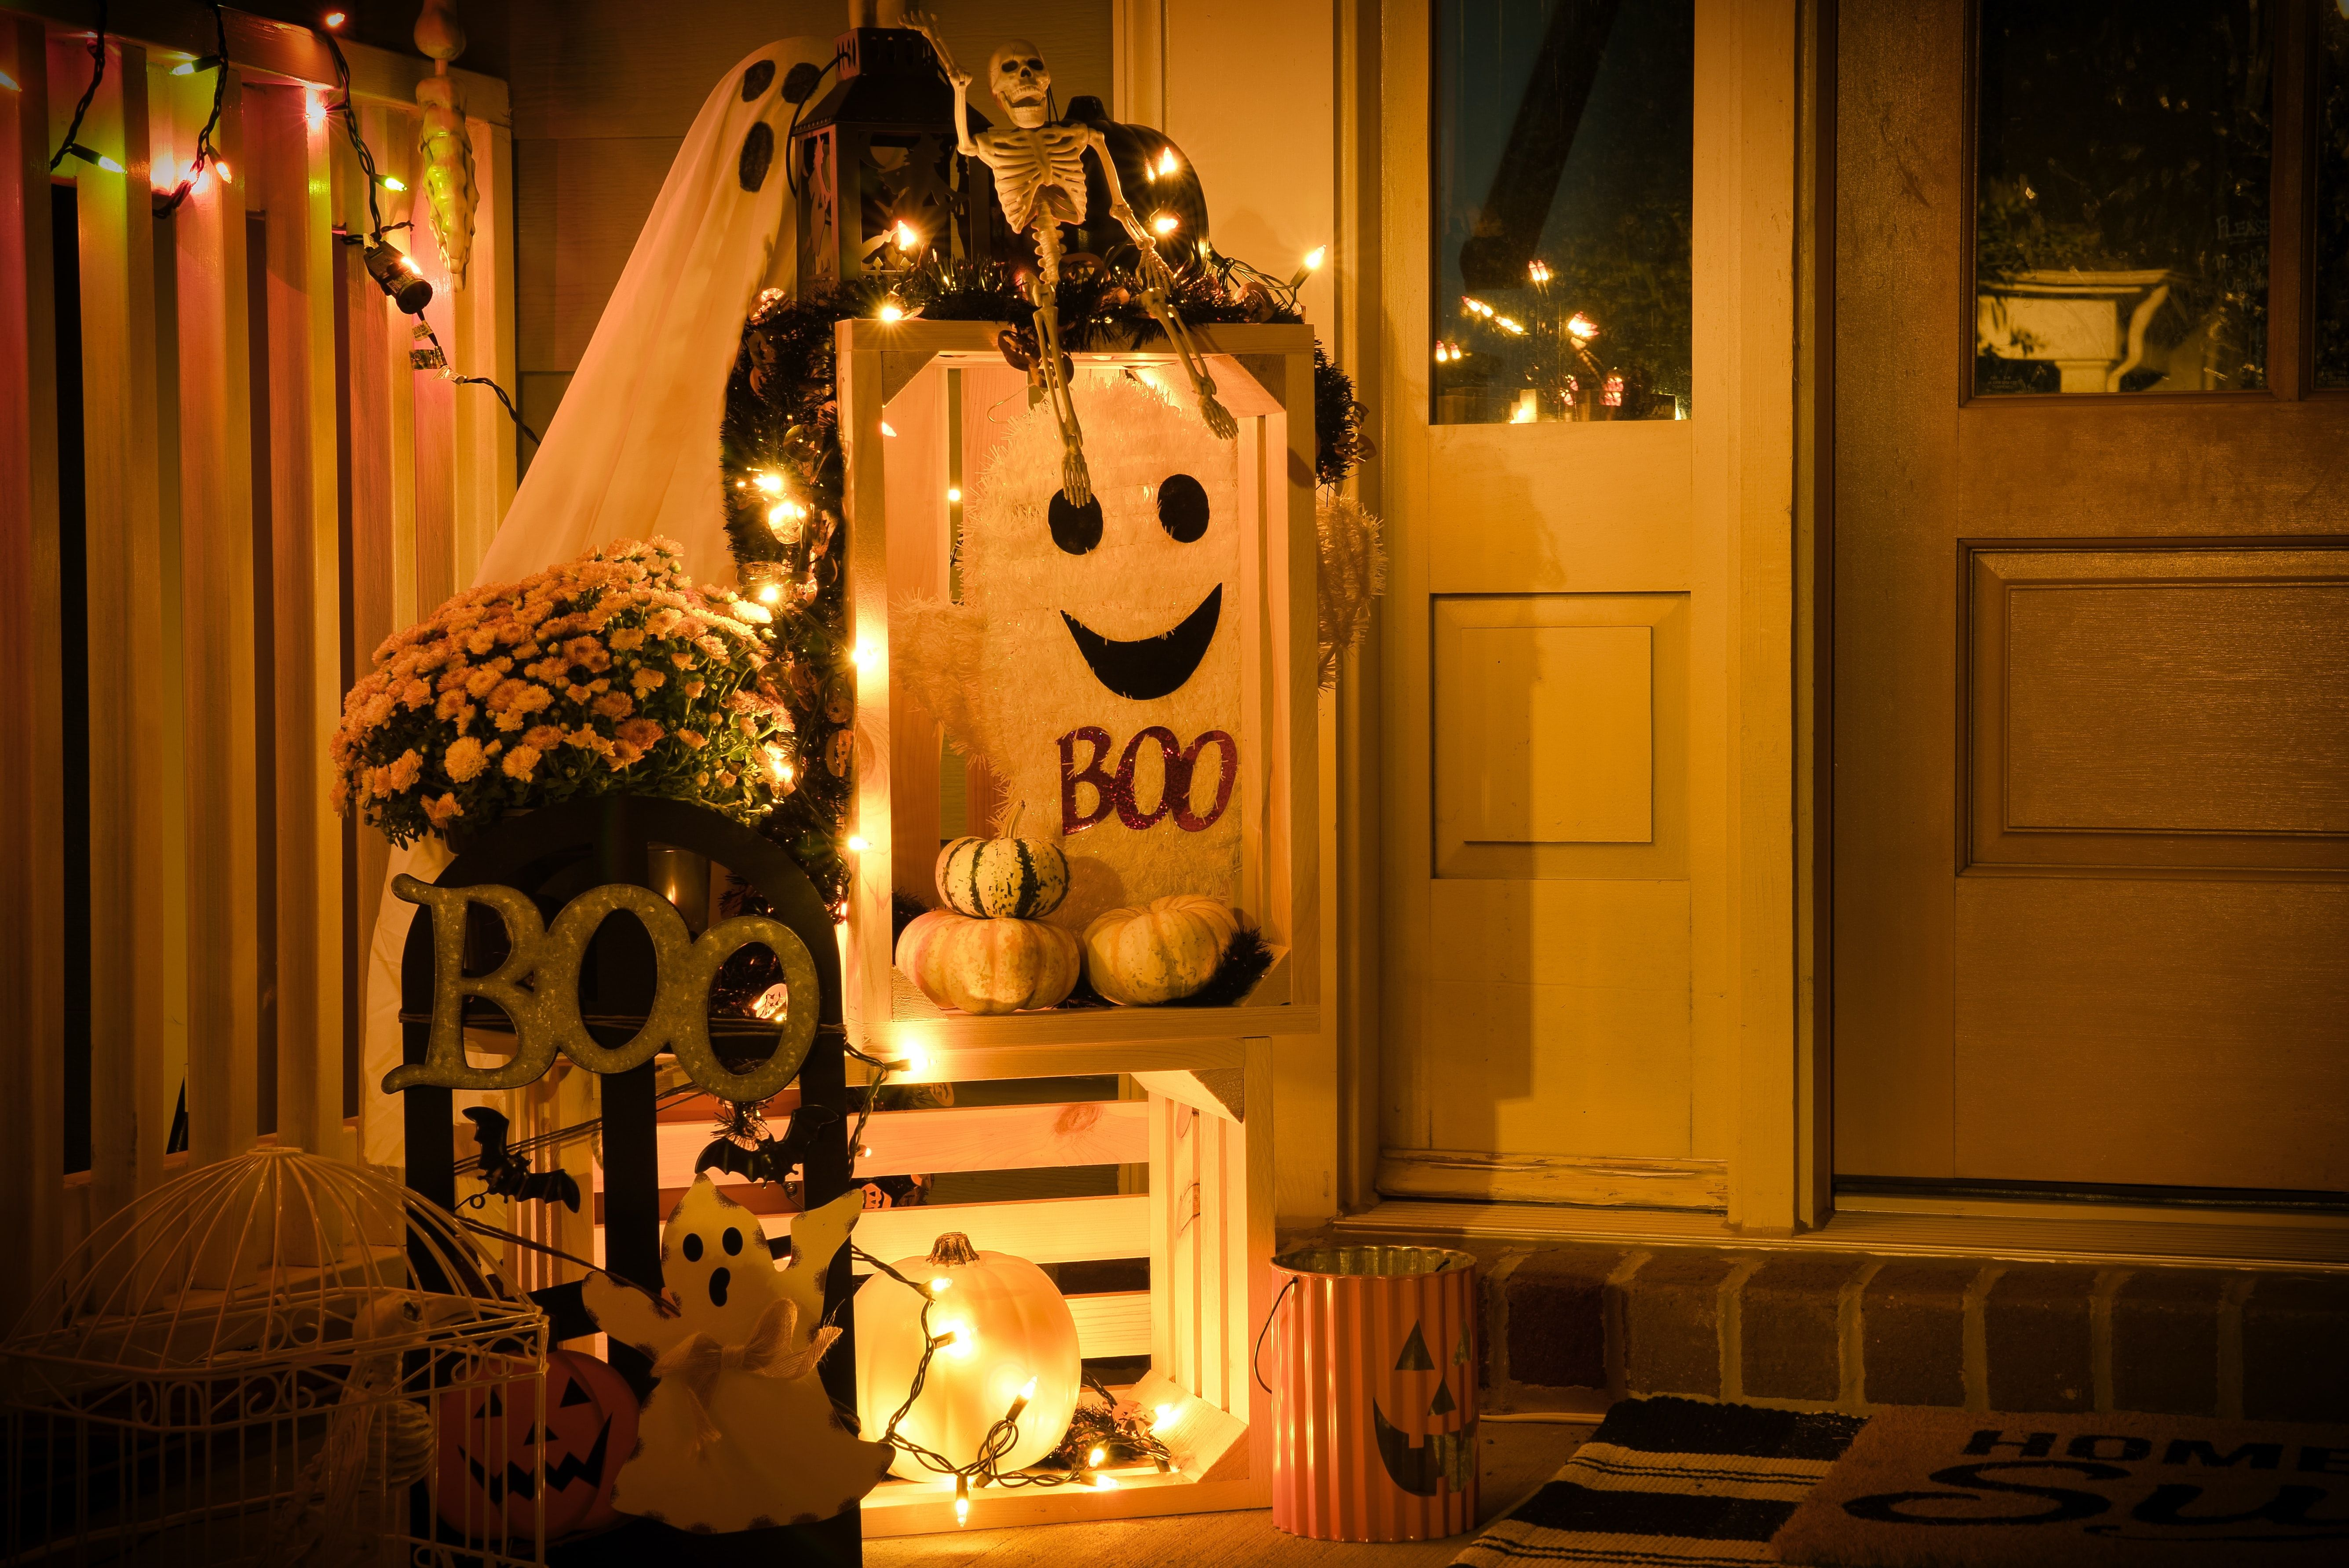 Breda Halloween.How To Keep Your Halloween Decorations Pest Free Breda Pest Management